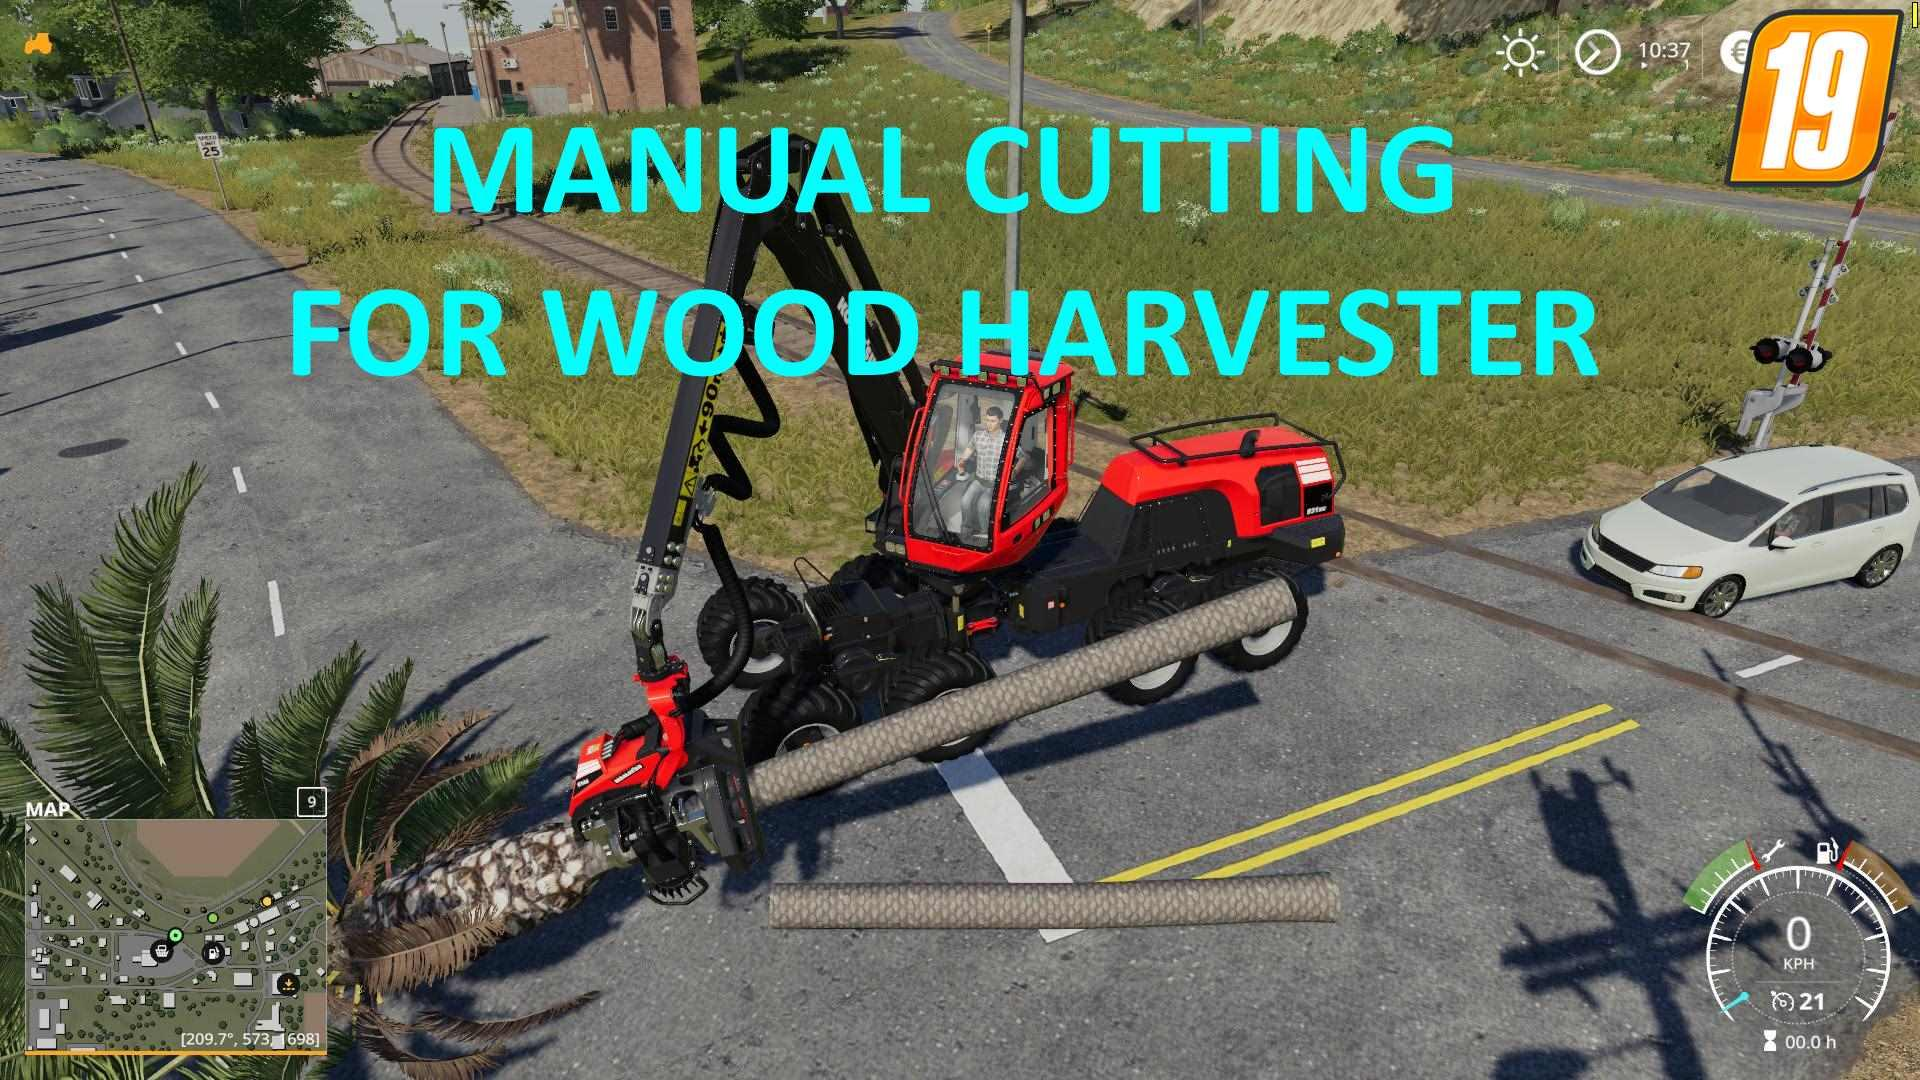 Manual Cutting for Wood Harvester v1 0 FS 19